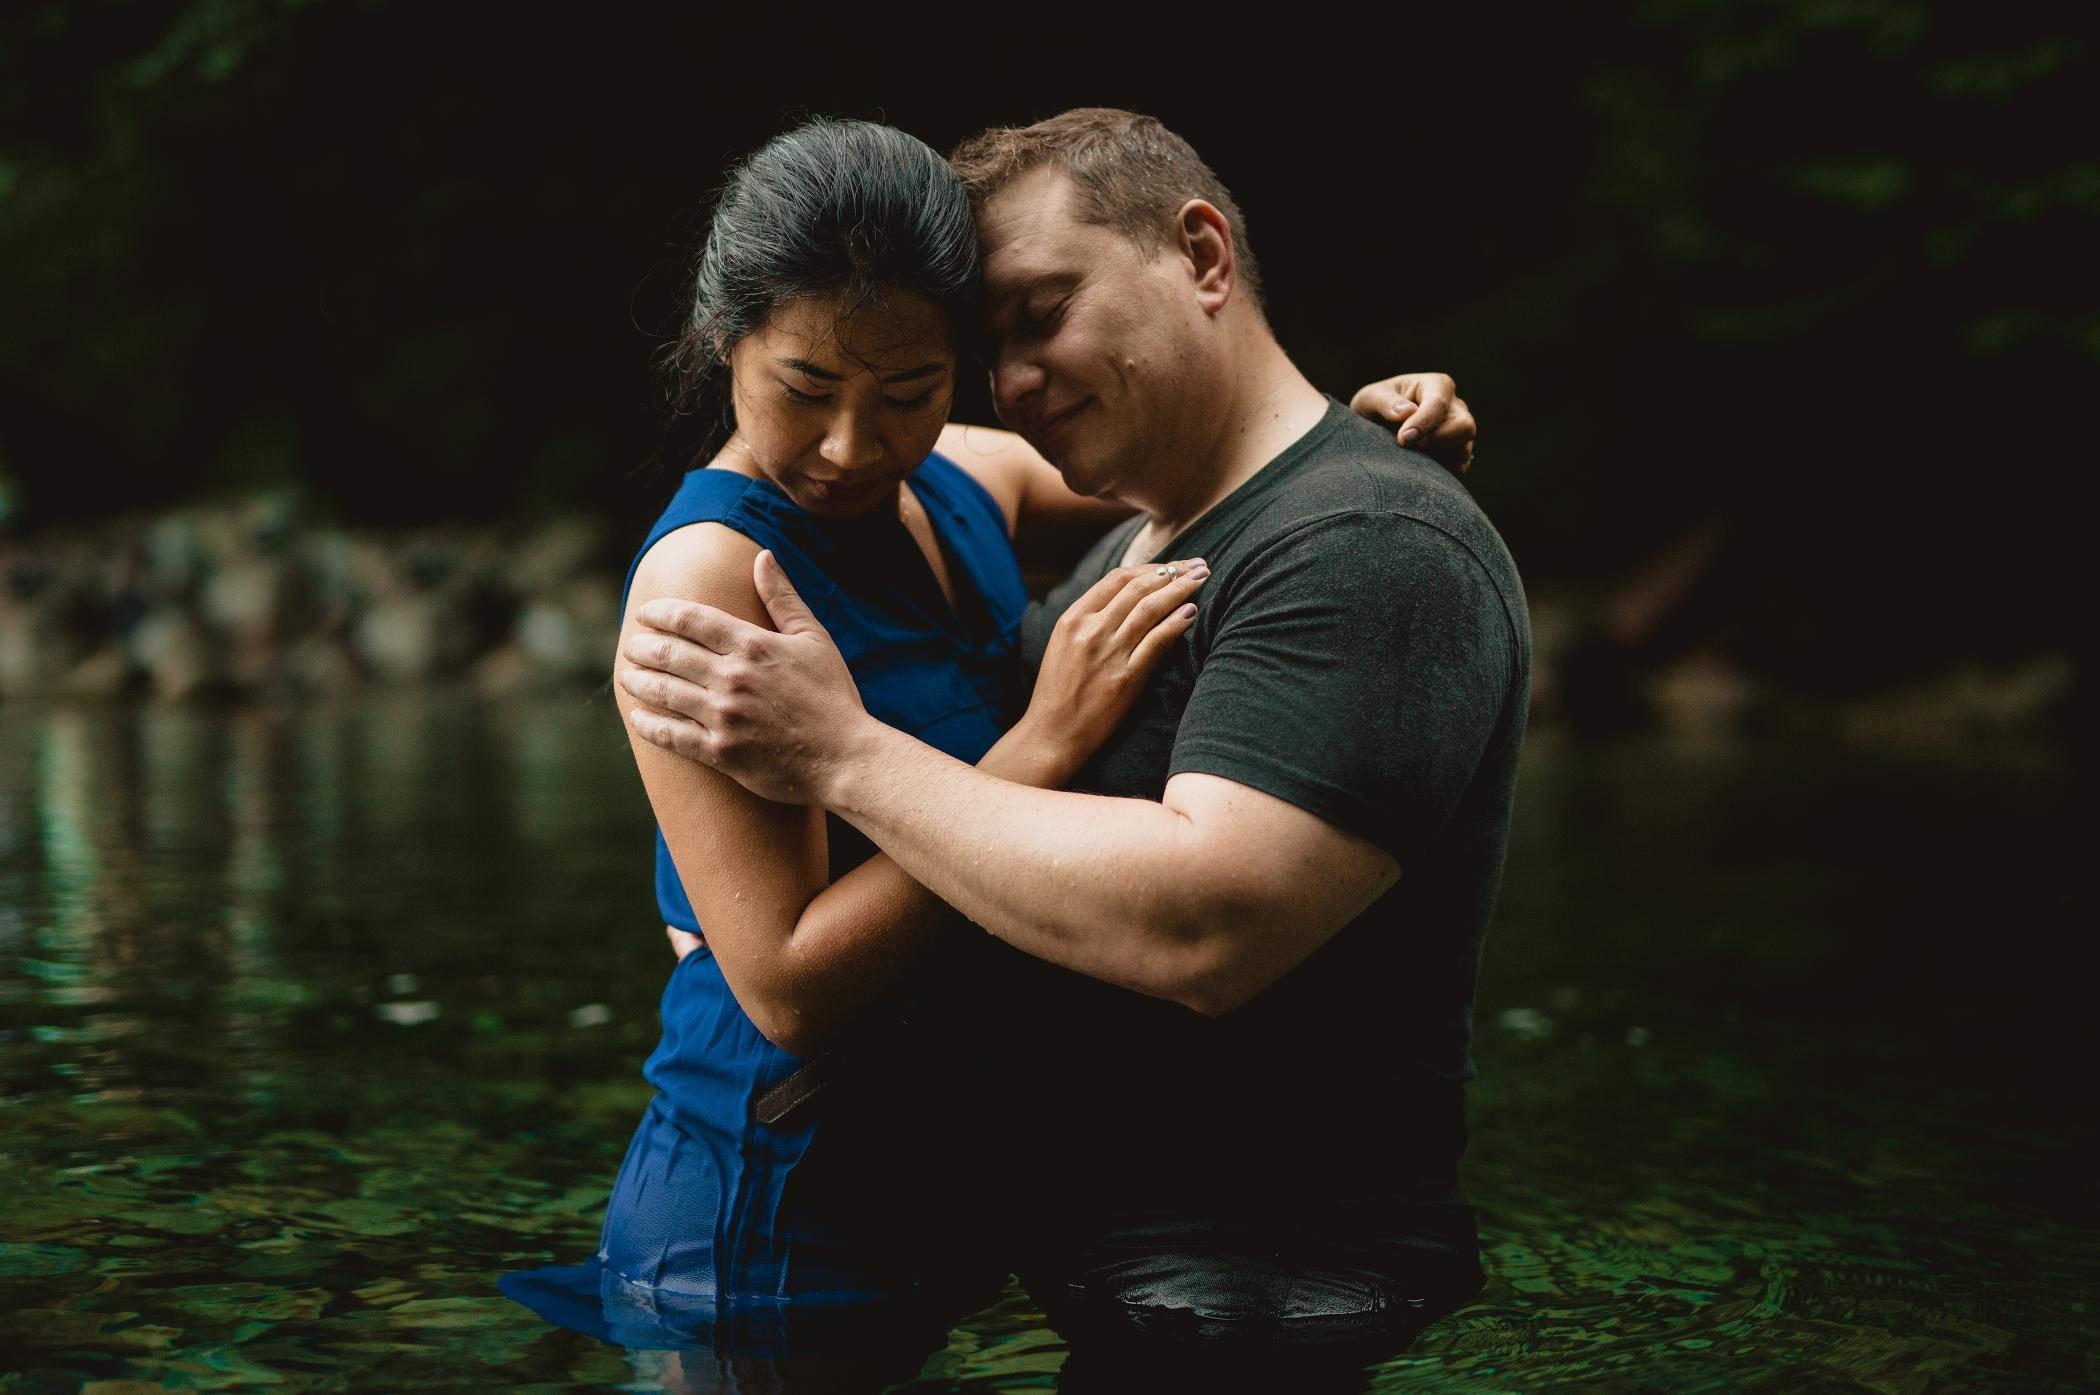 engagement photographer Vancouver